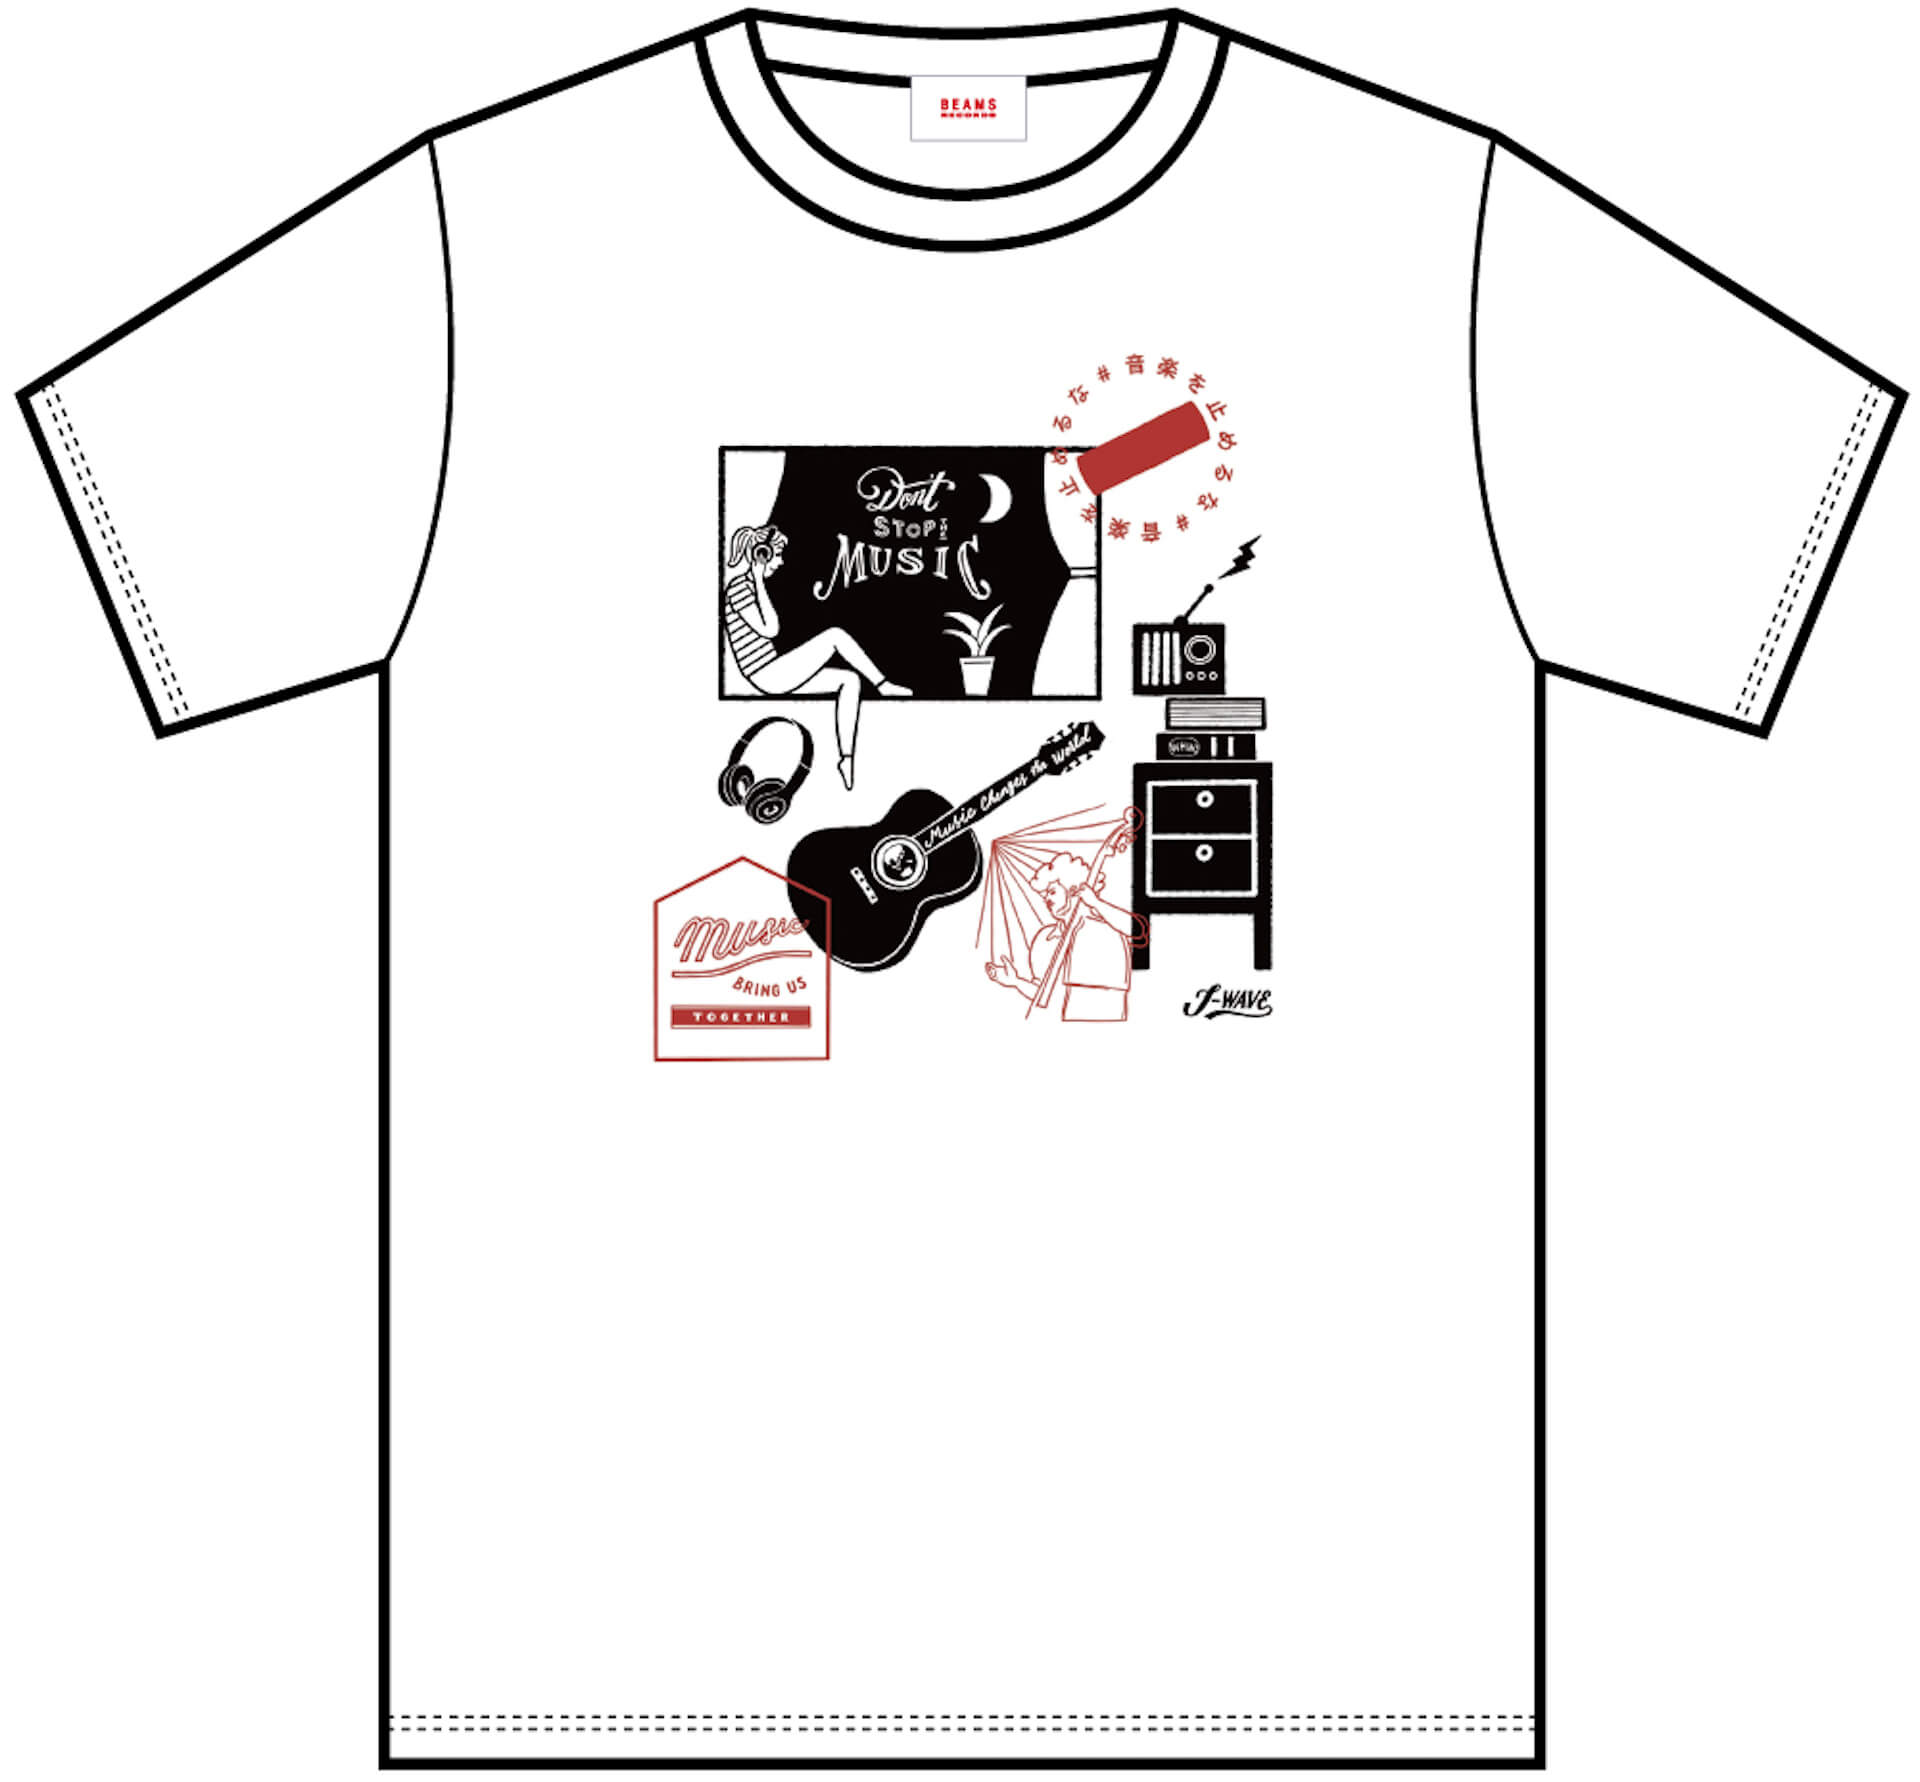 J-WAVE「#音楽を止めるな」BEAMS RECORDS協力のもと、ライブハウスを支援するオリジナルTシャツが受注販売開始! lf200515_jwave_beamsrecords_tshirts_12